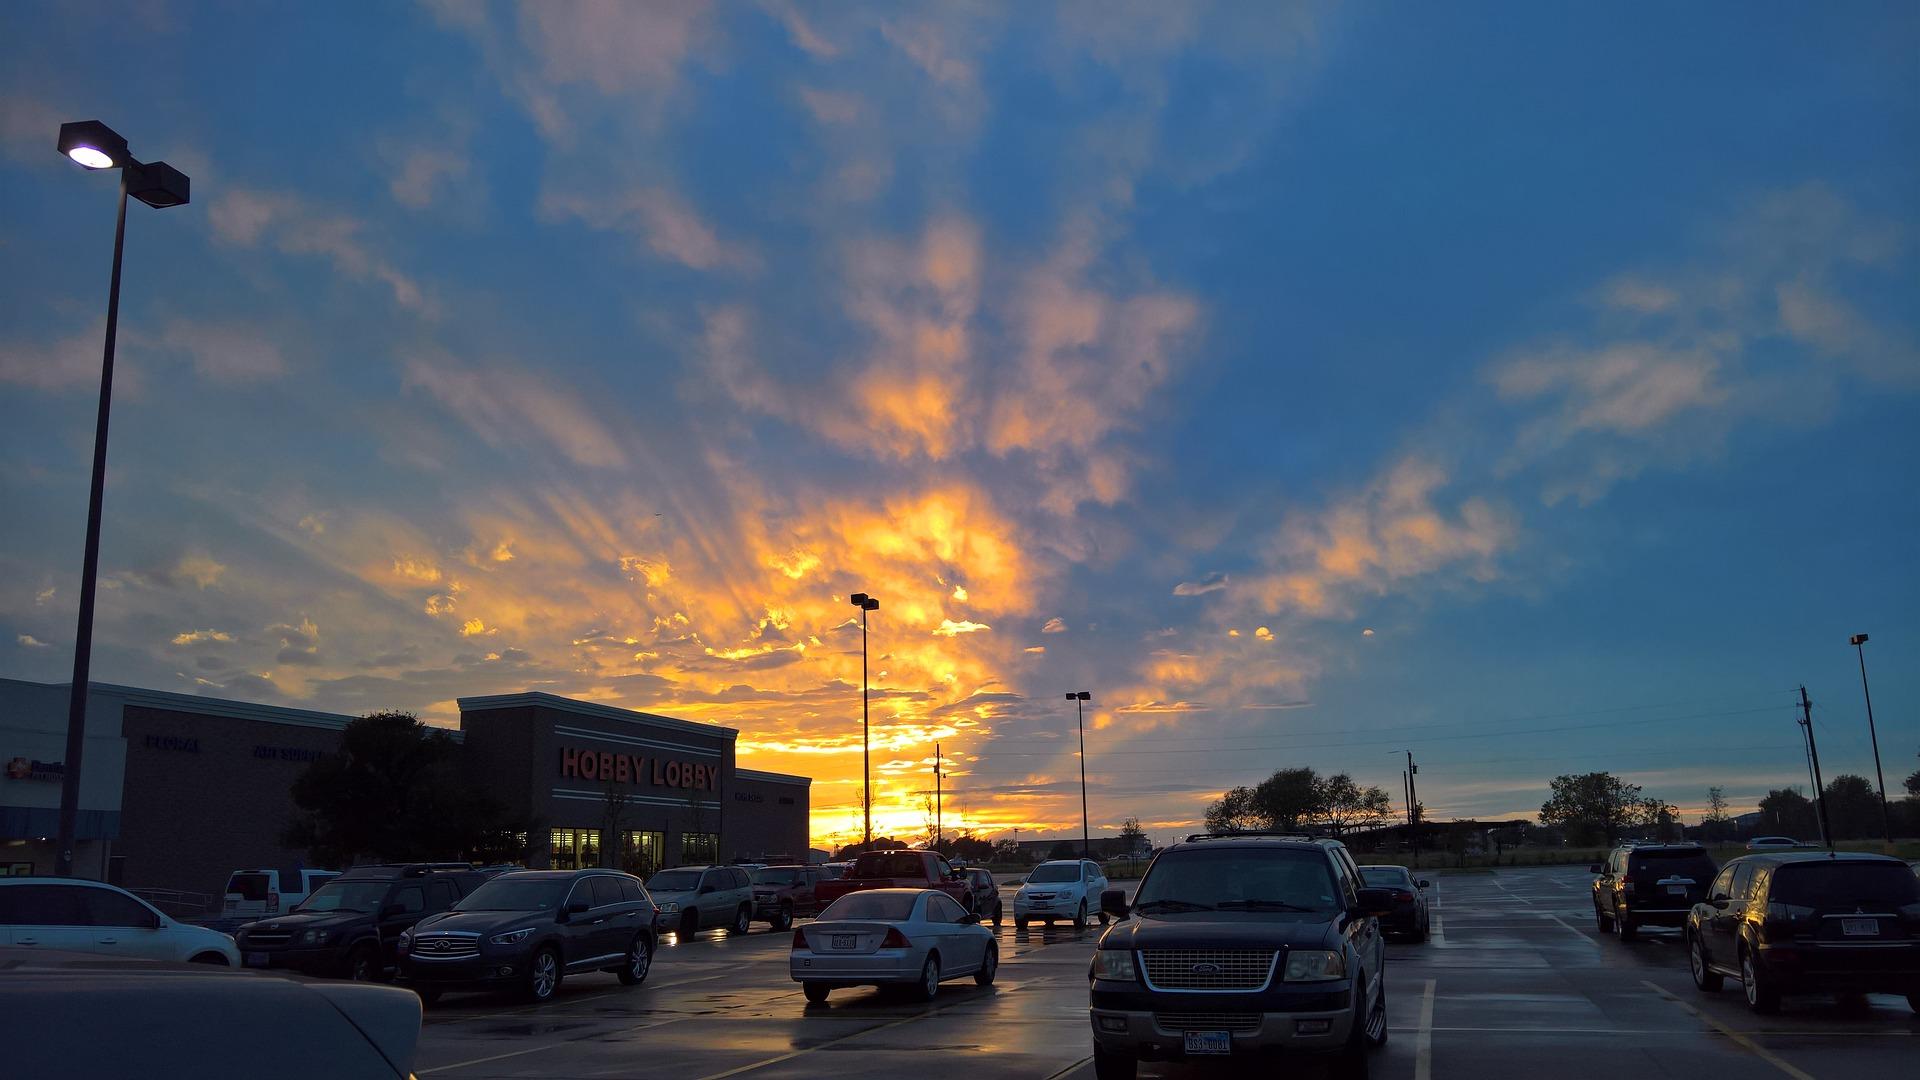 sunset-2144479_1920.jpg